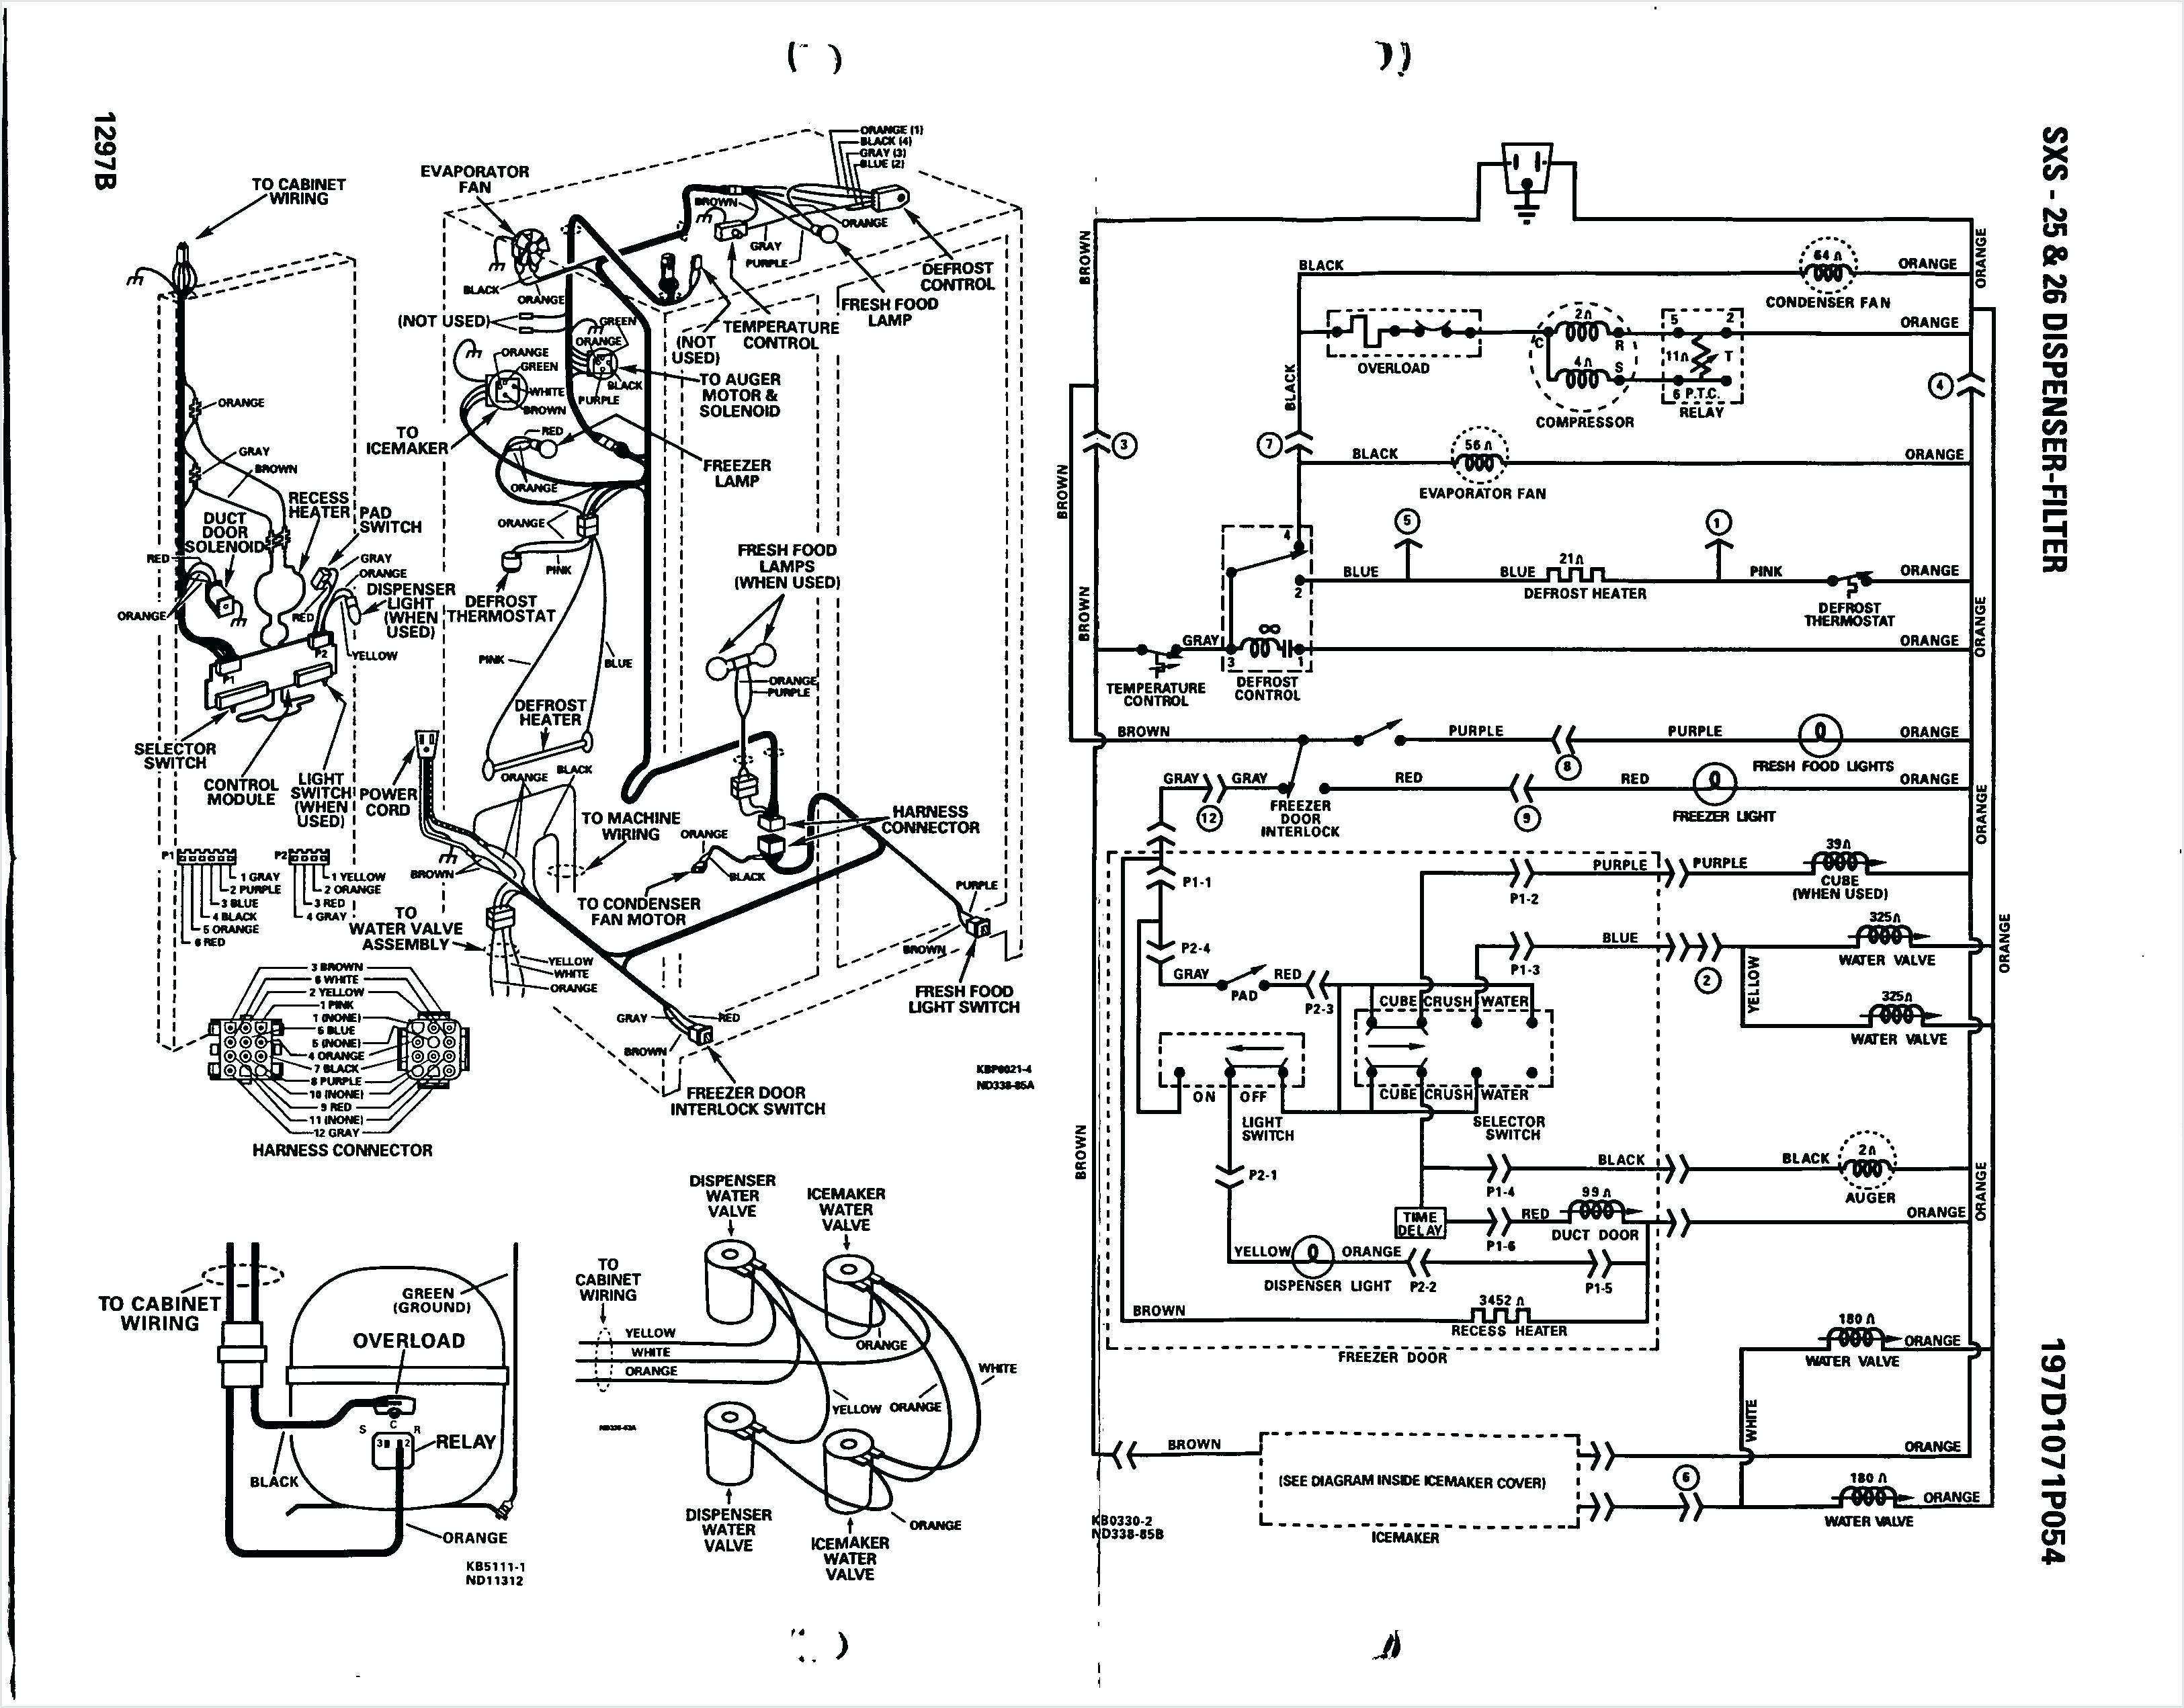 whirlpool dryer wiring diagram whirlpool ler4634eq2 best